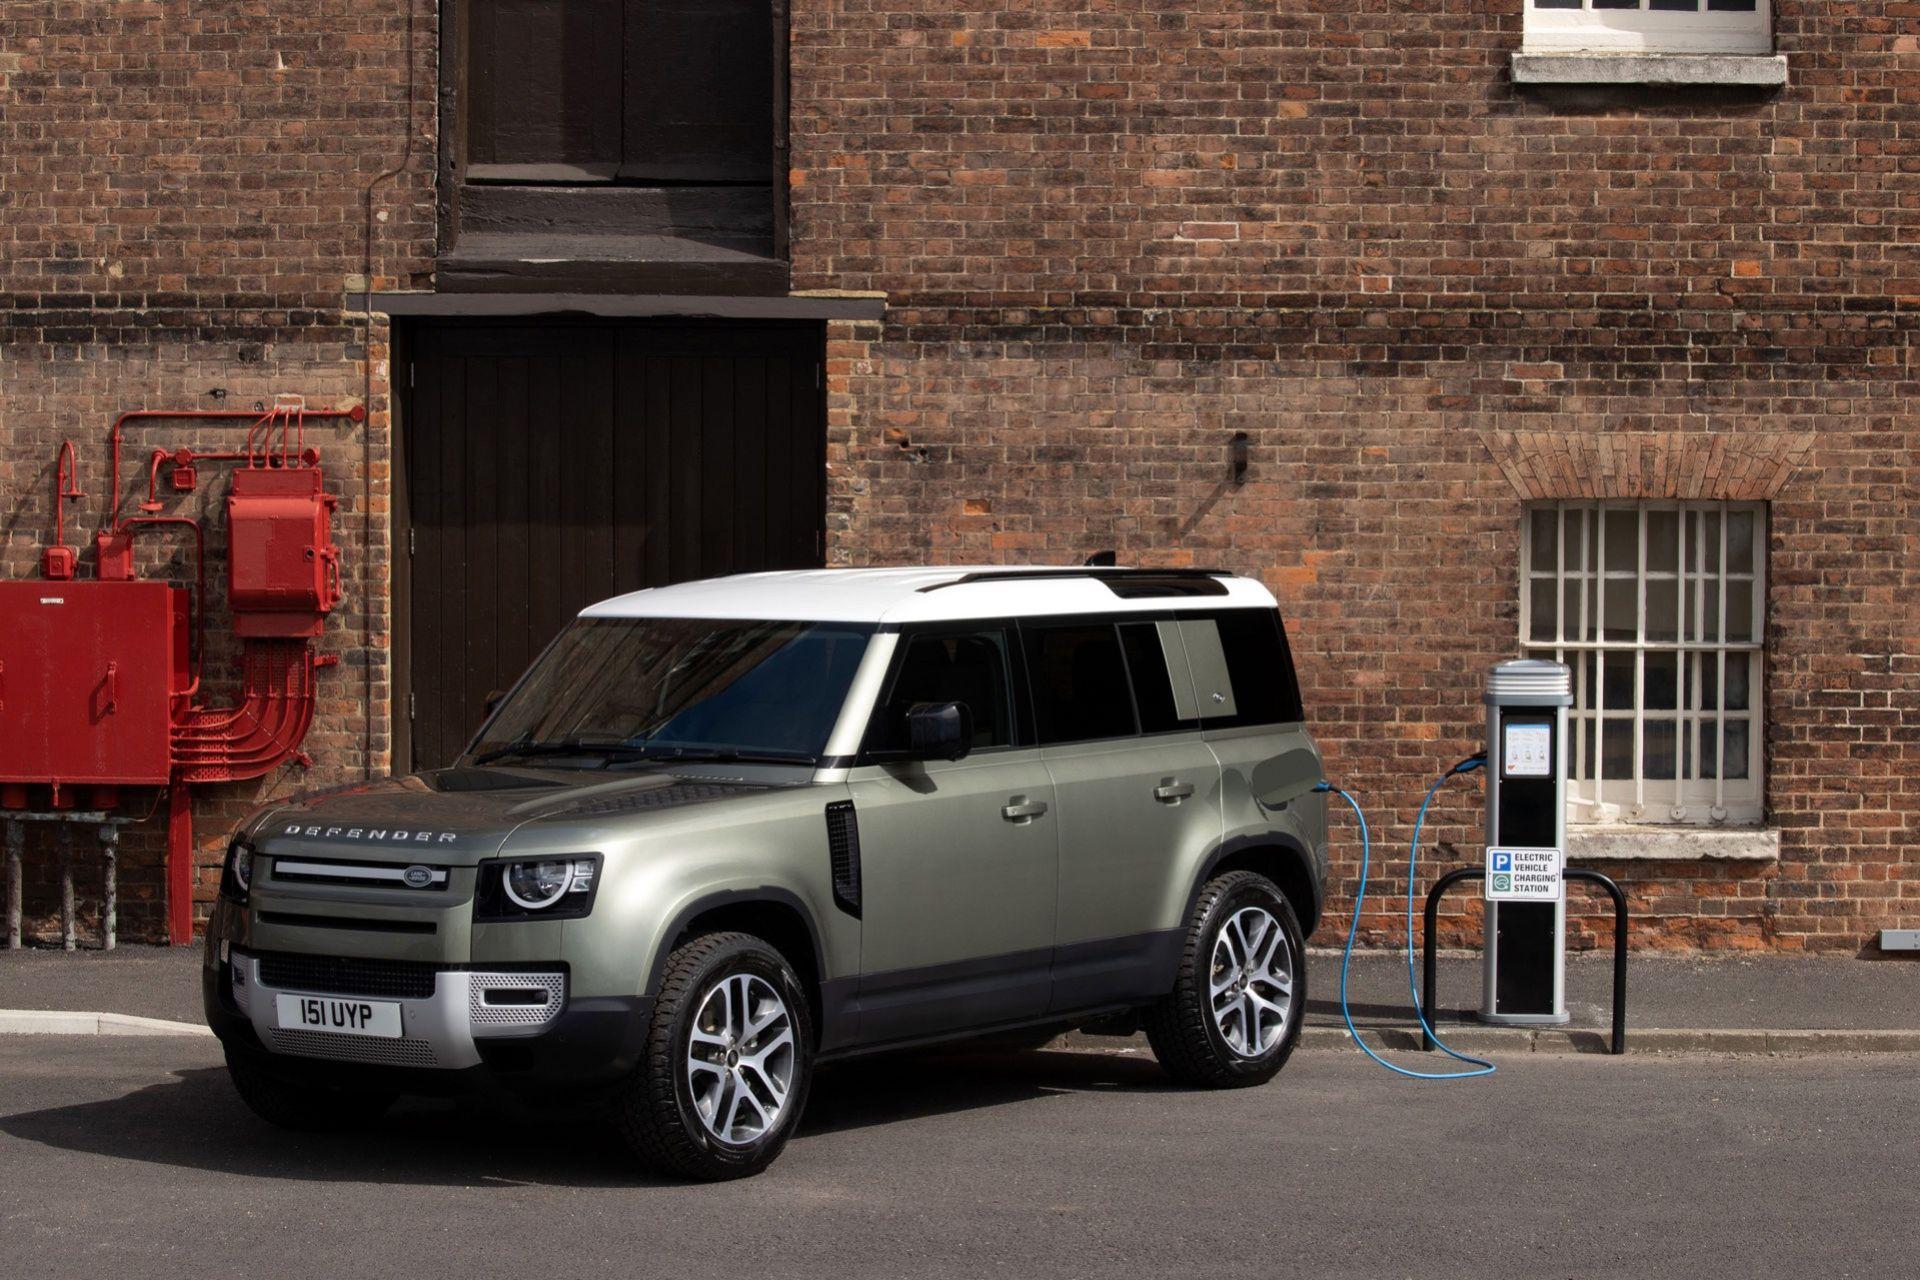 Nya Land Rover Defender nu även som laddhybrid